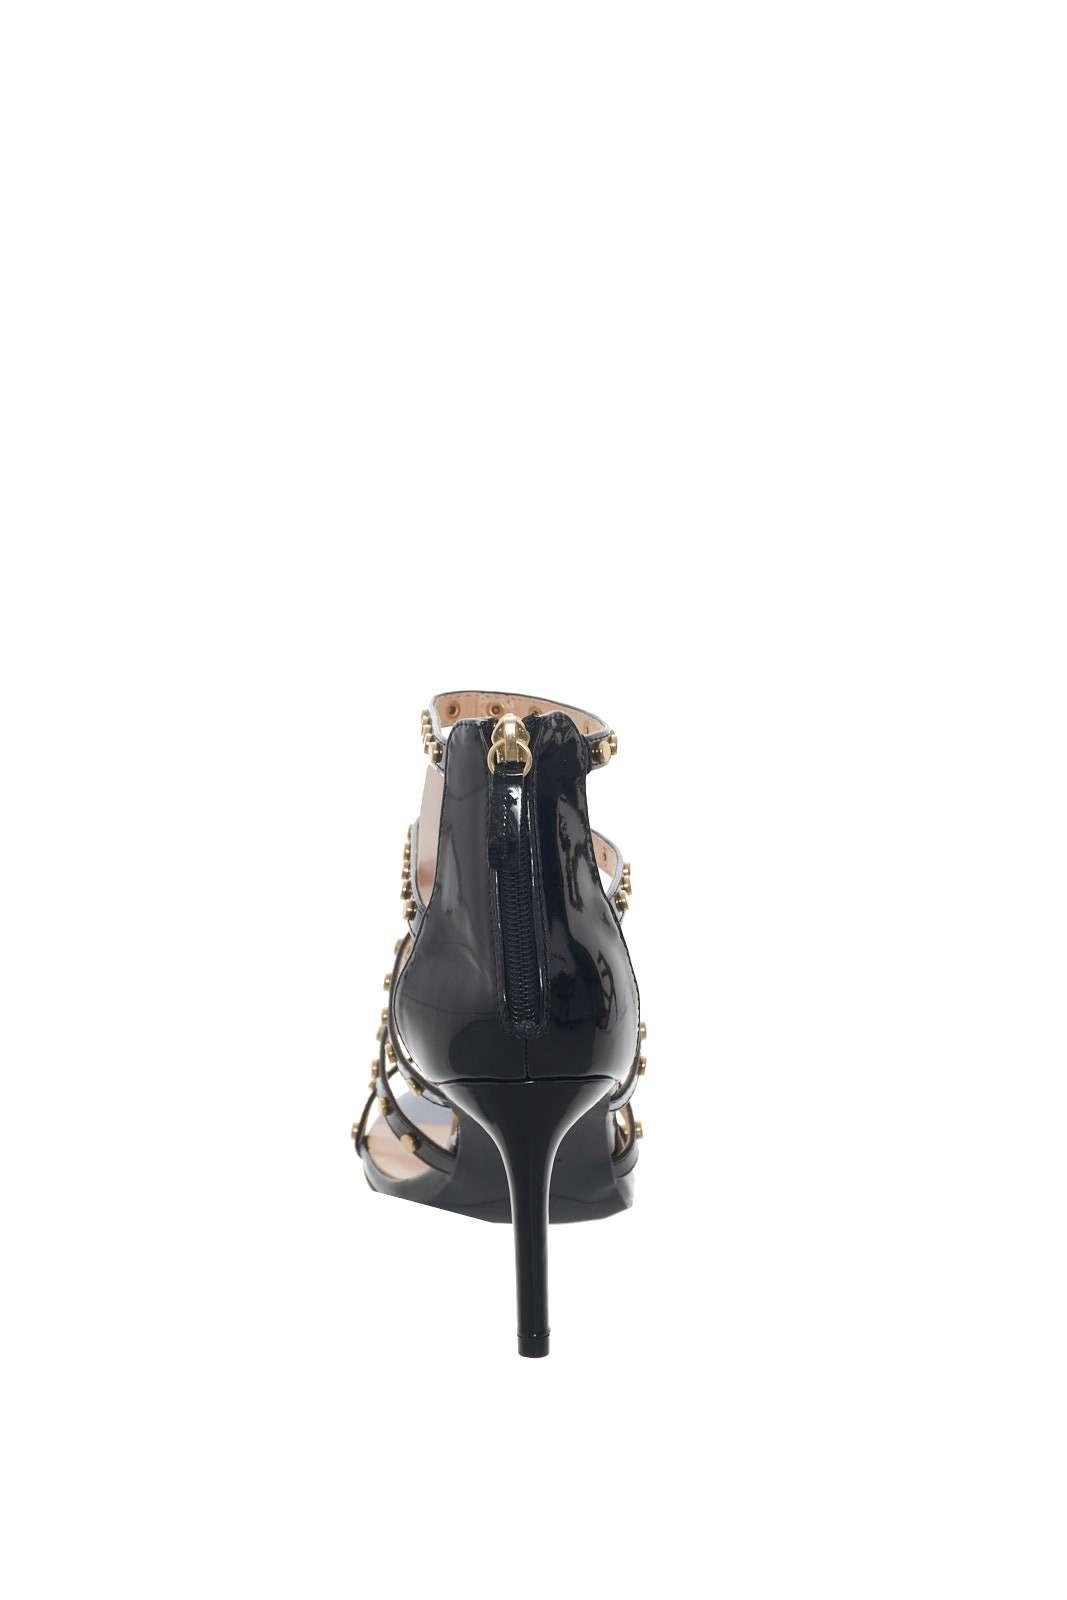 https://www.parmax.com/media/catalog/product/a/i/PE-outlet_parmax-sandali-donna-Francesco-Milano-s173p-D.jpg